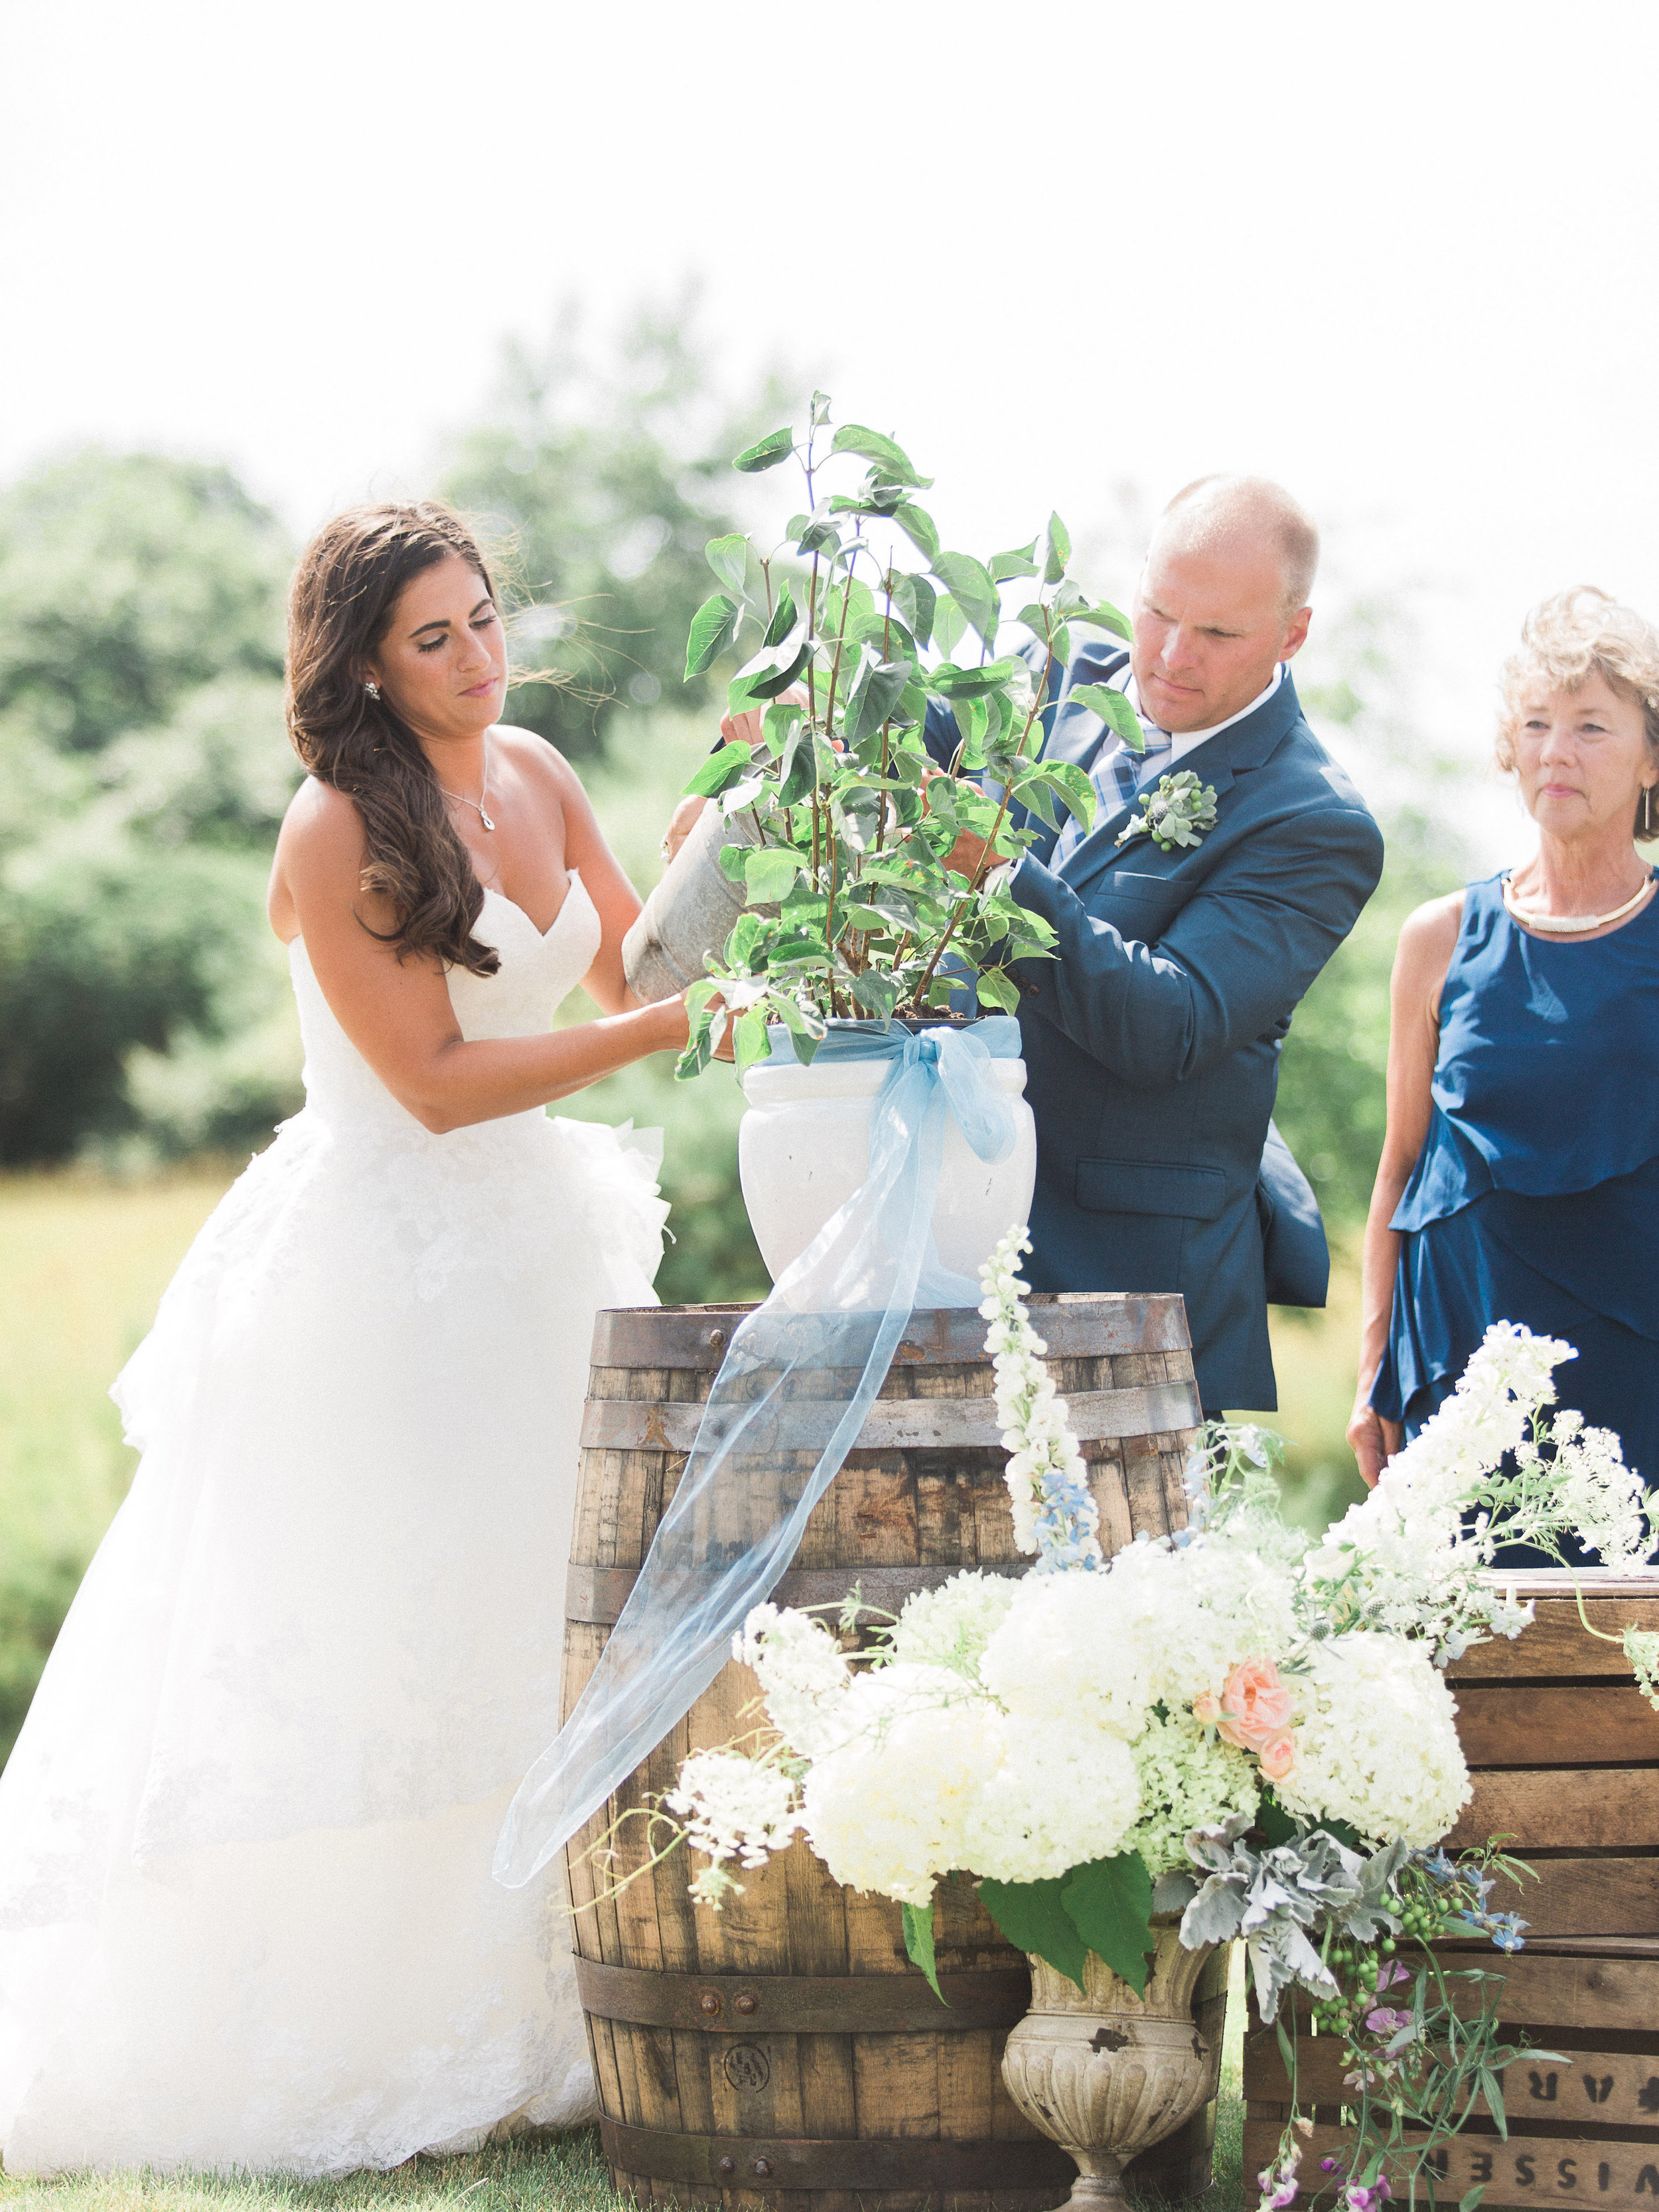 ERIC AND HALLIE WEDDING-HI RESOLUTION FOR PRINTING-0632.jpg